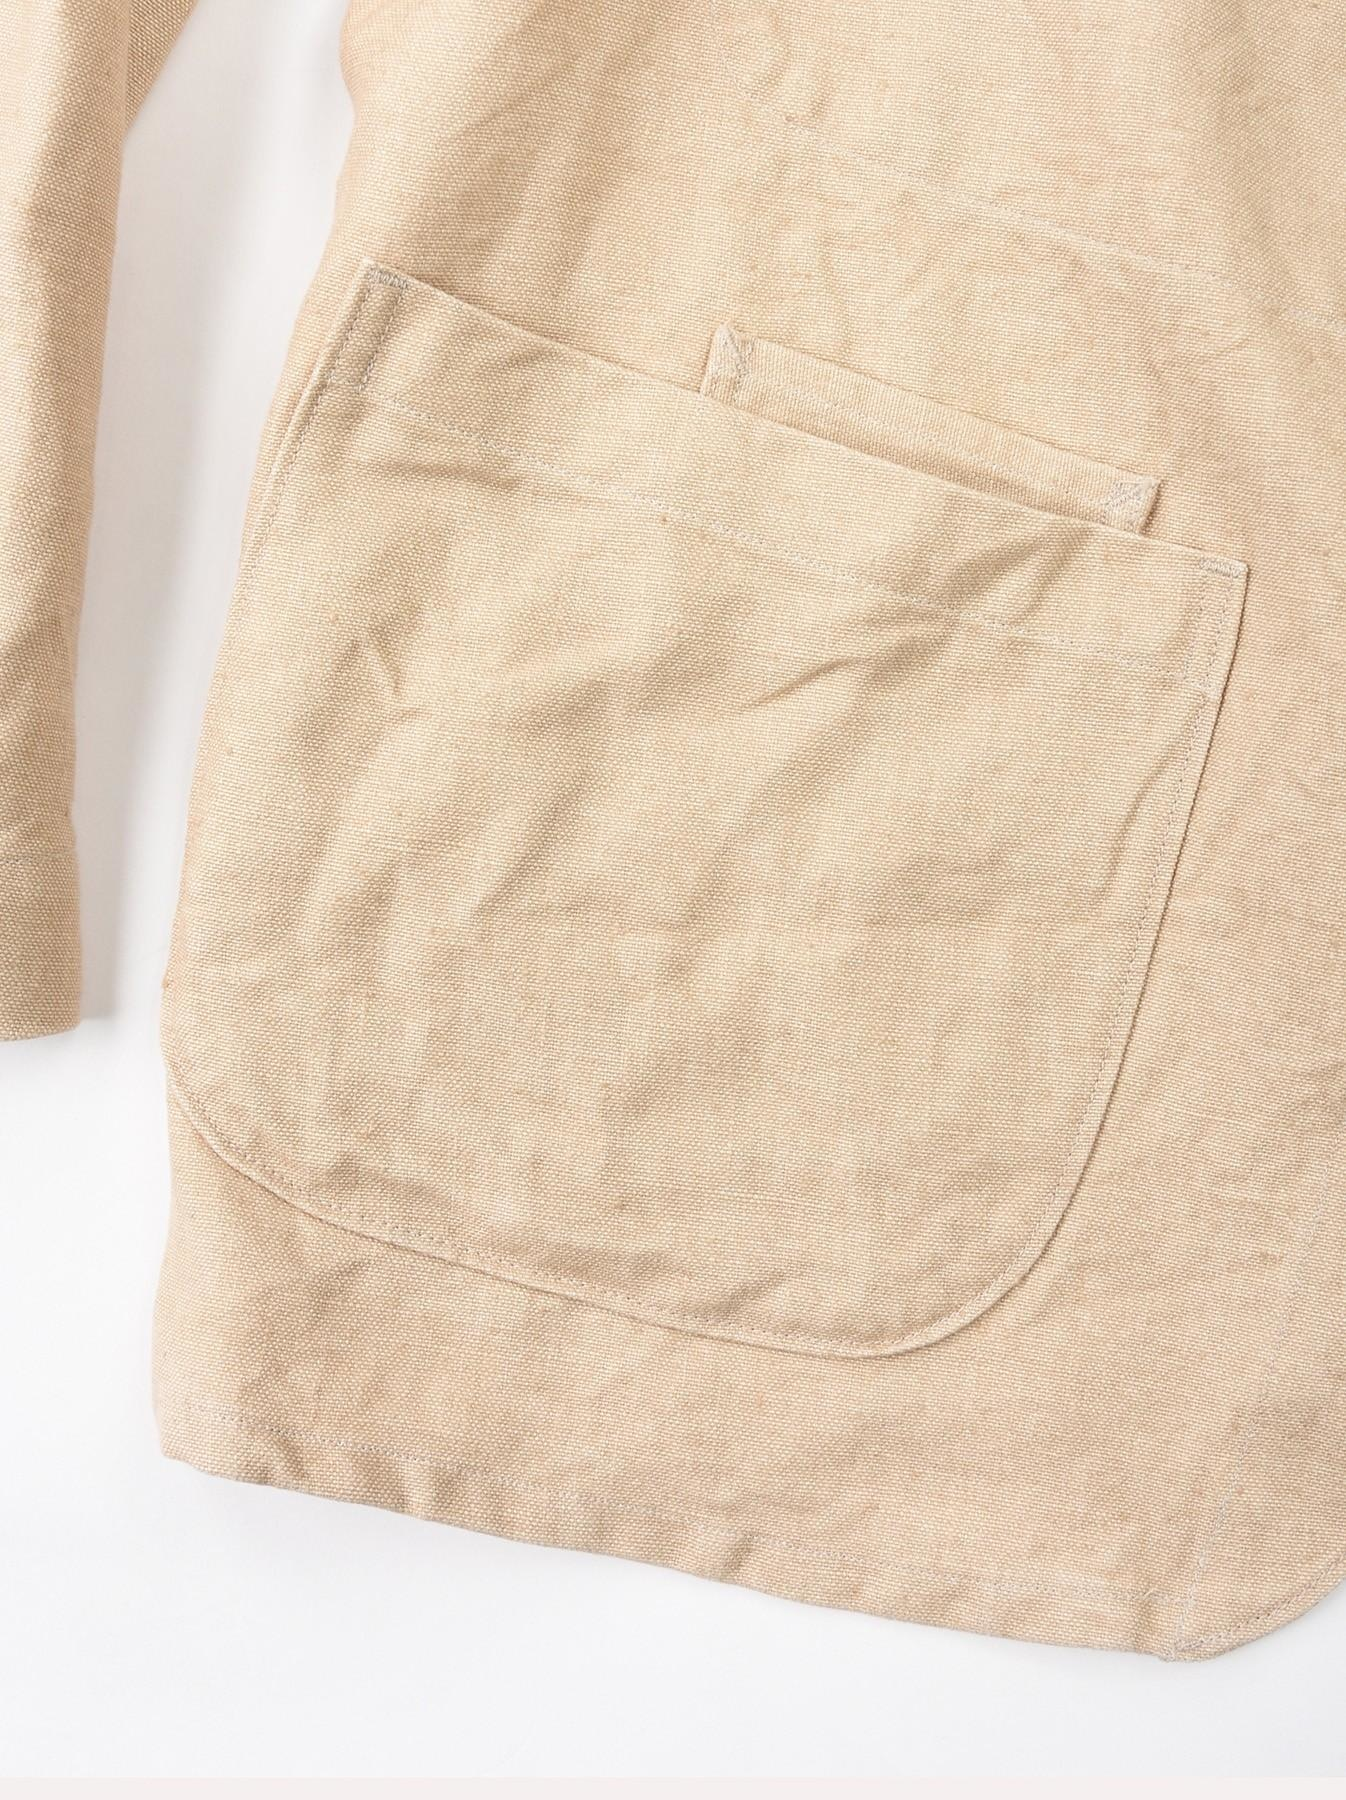 Linen Duck Asama Jacket-10